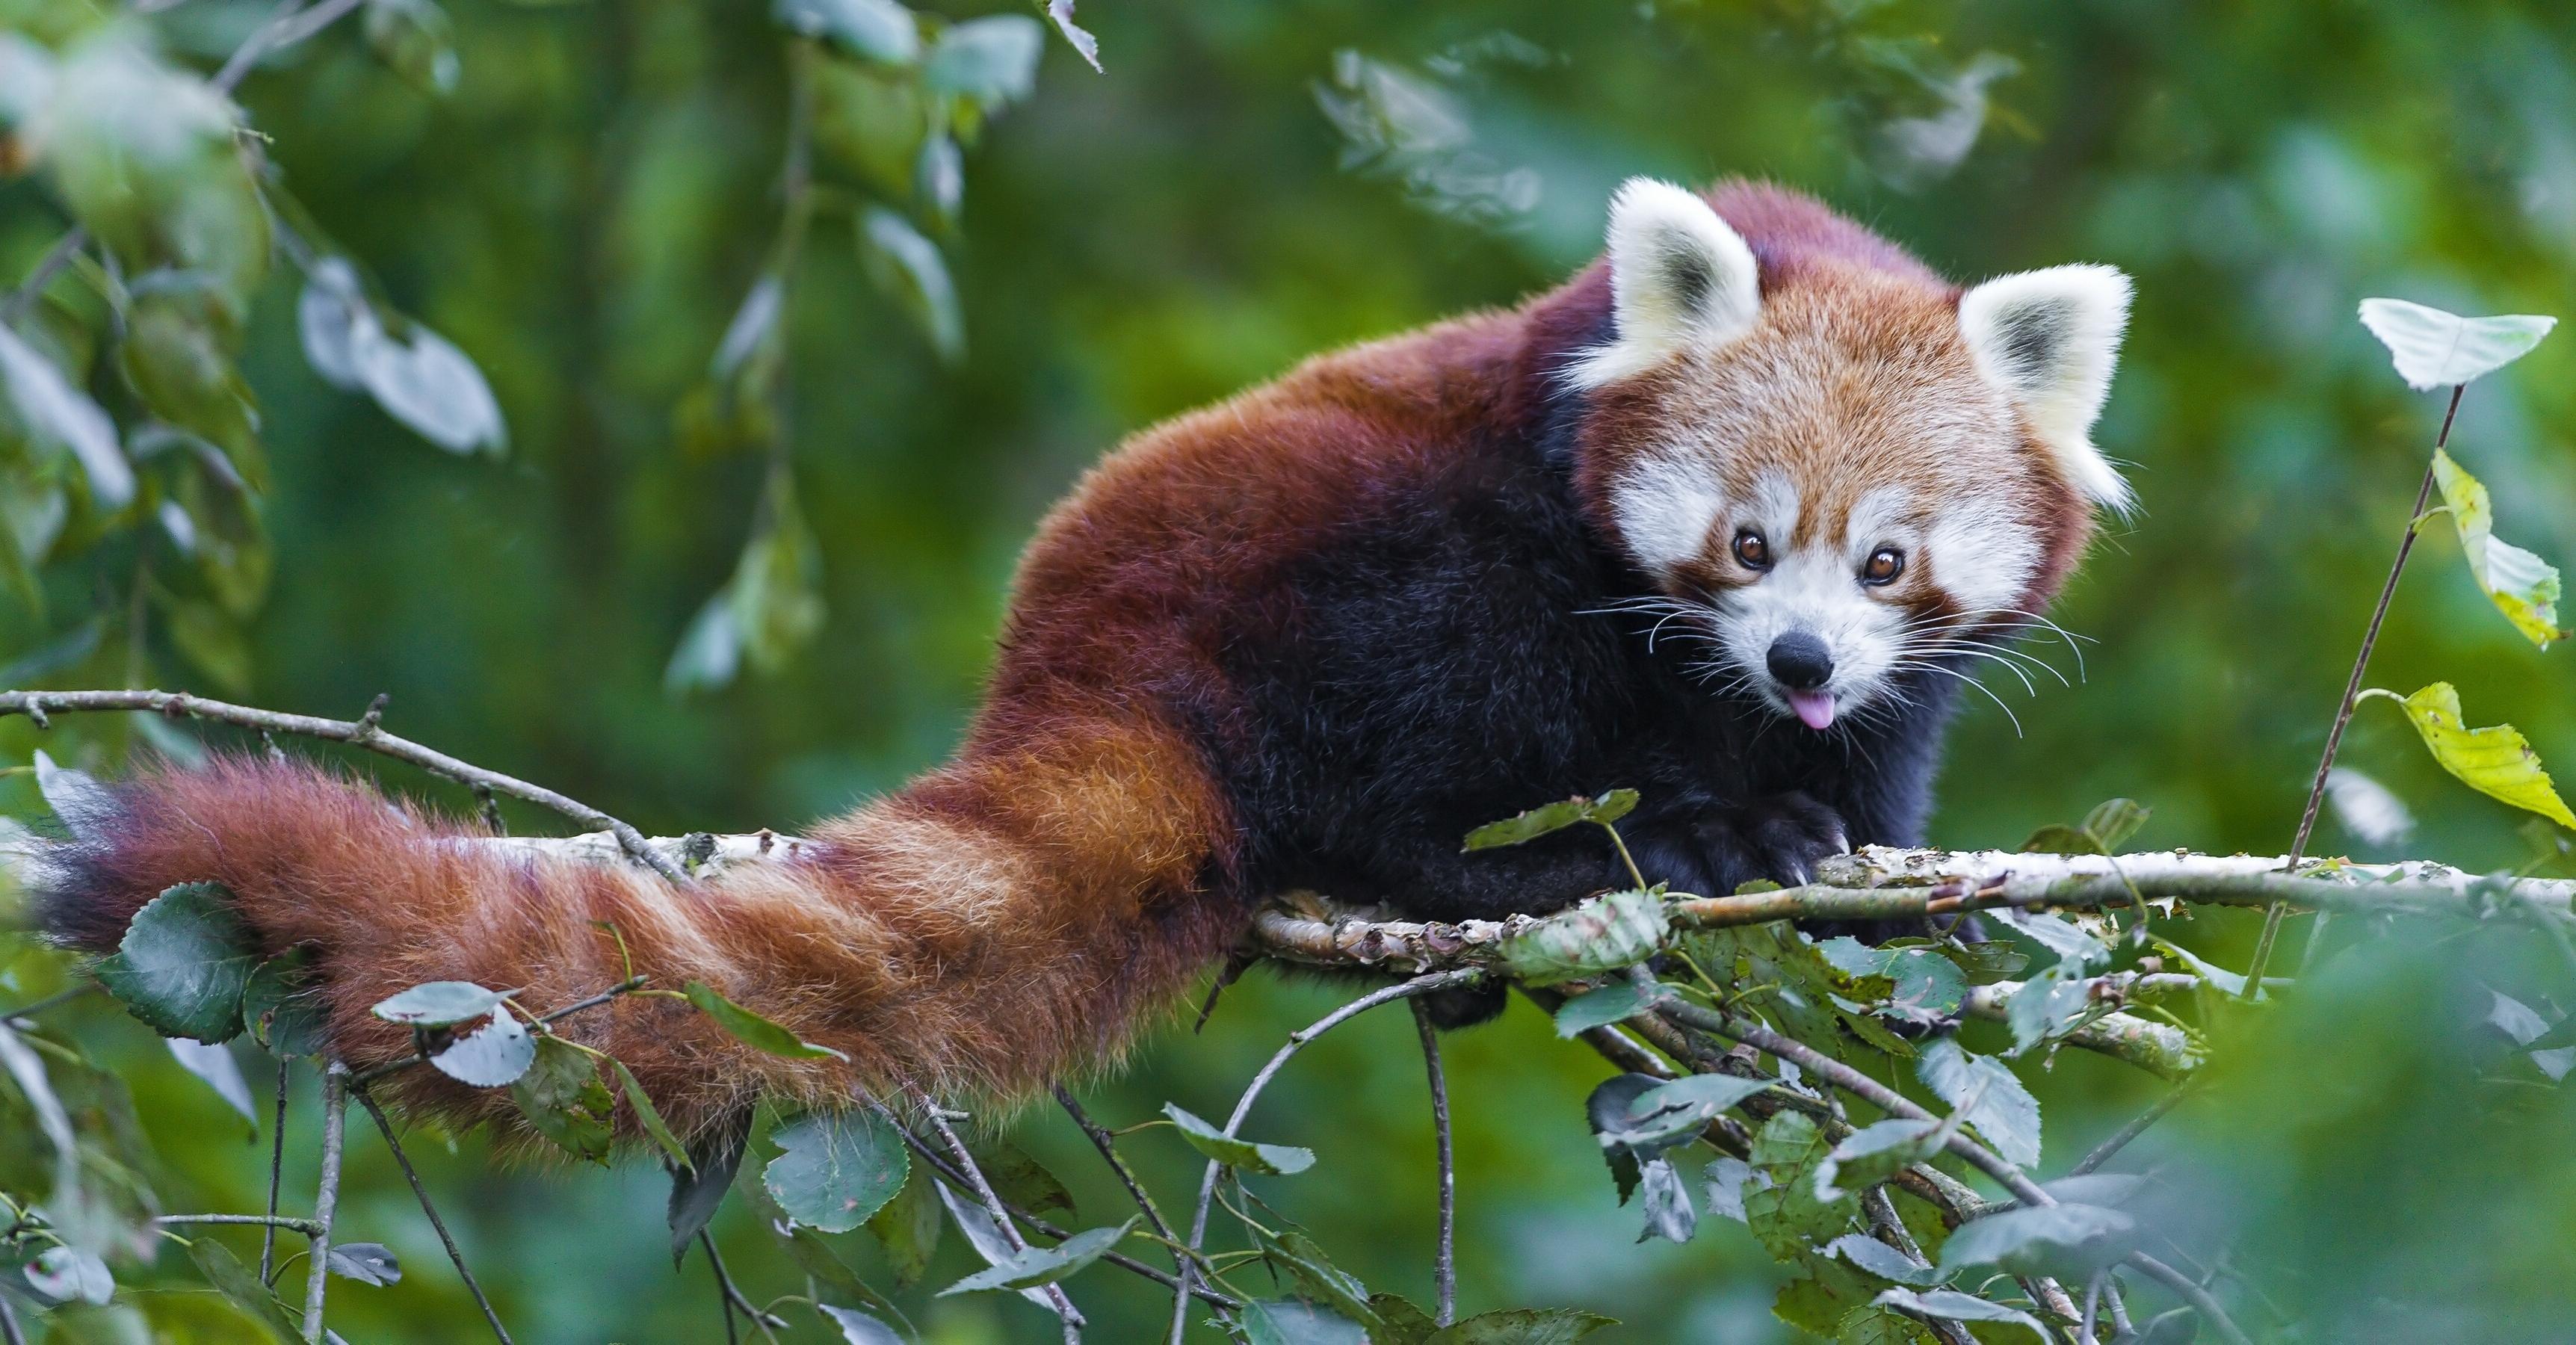 Red Panda wallpapers (68 Wallpapers) – Wallpapers For Desktop